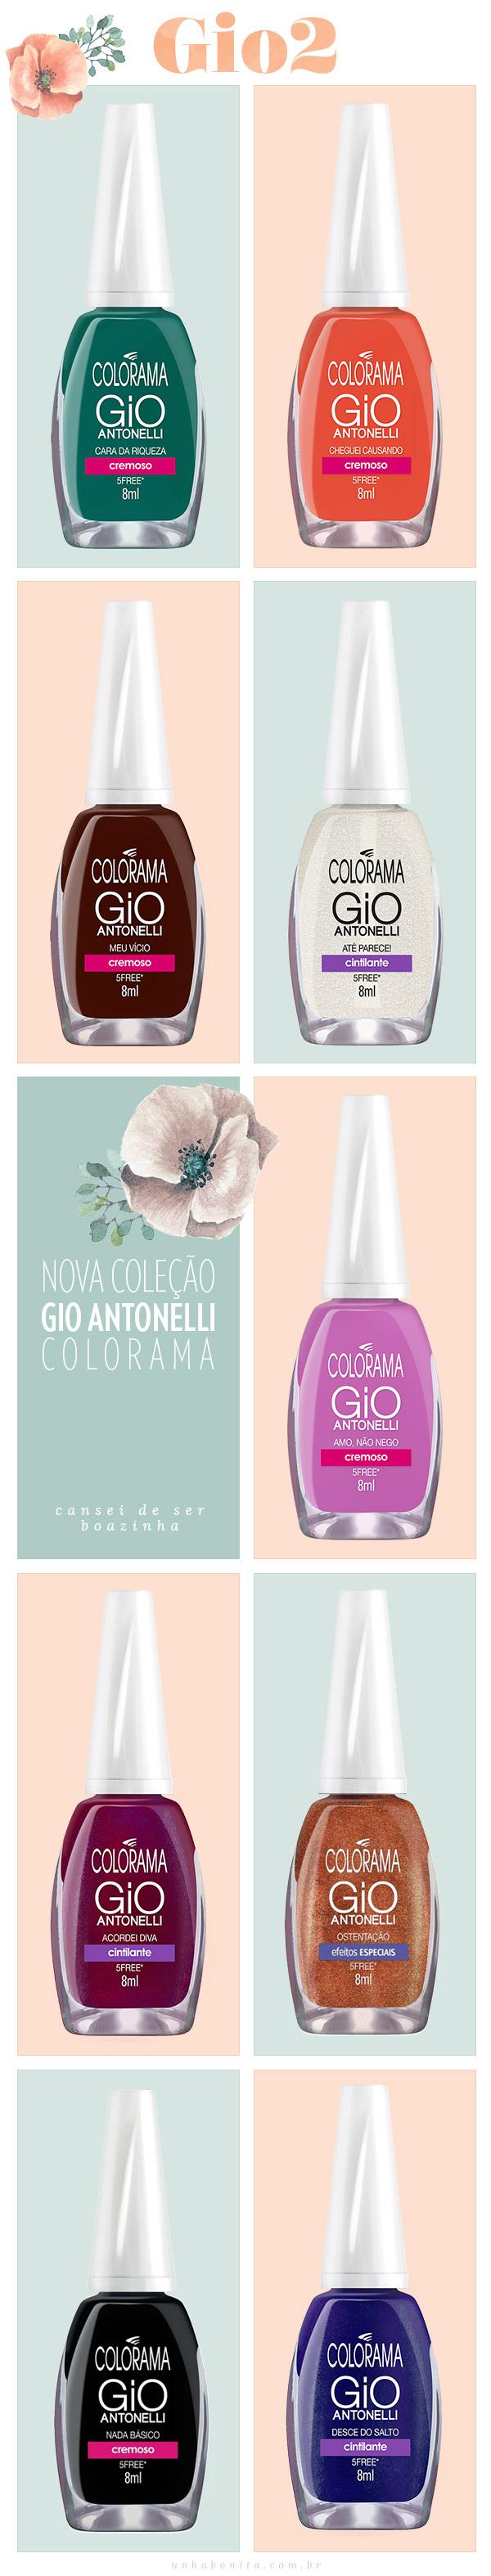 gio-2-colorama-cansei-de-ser-boazinha